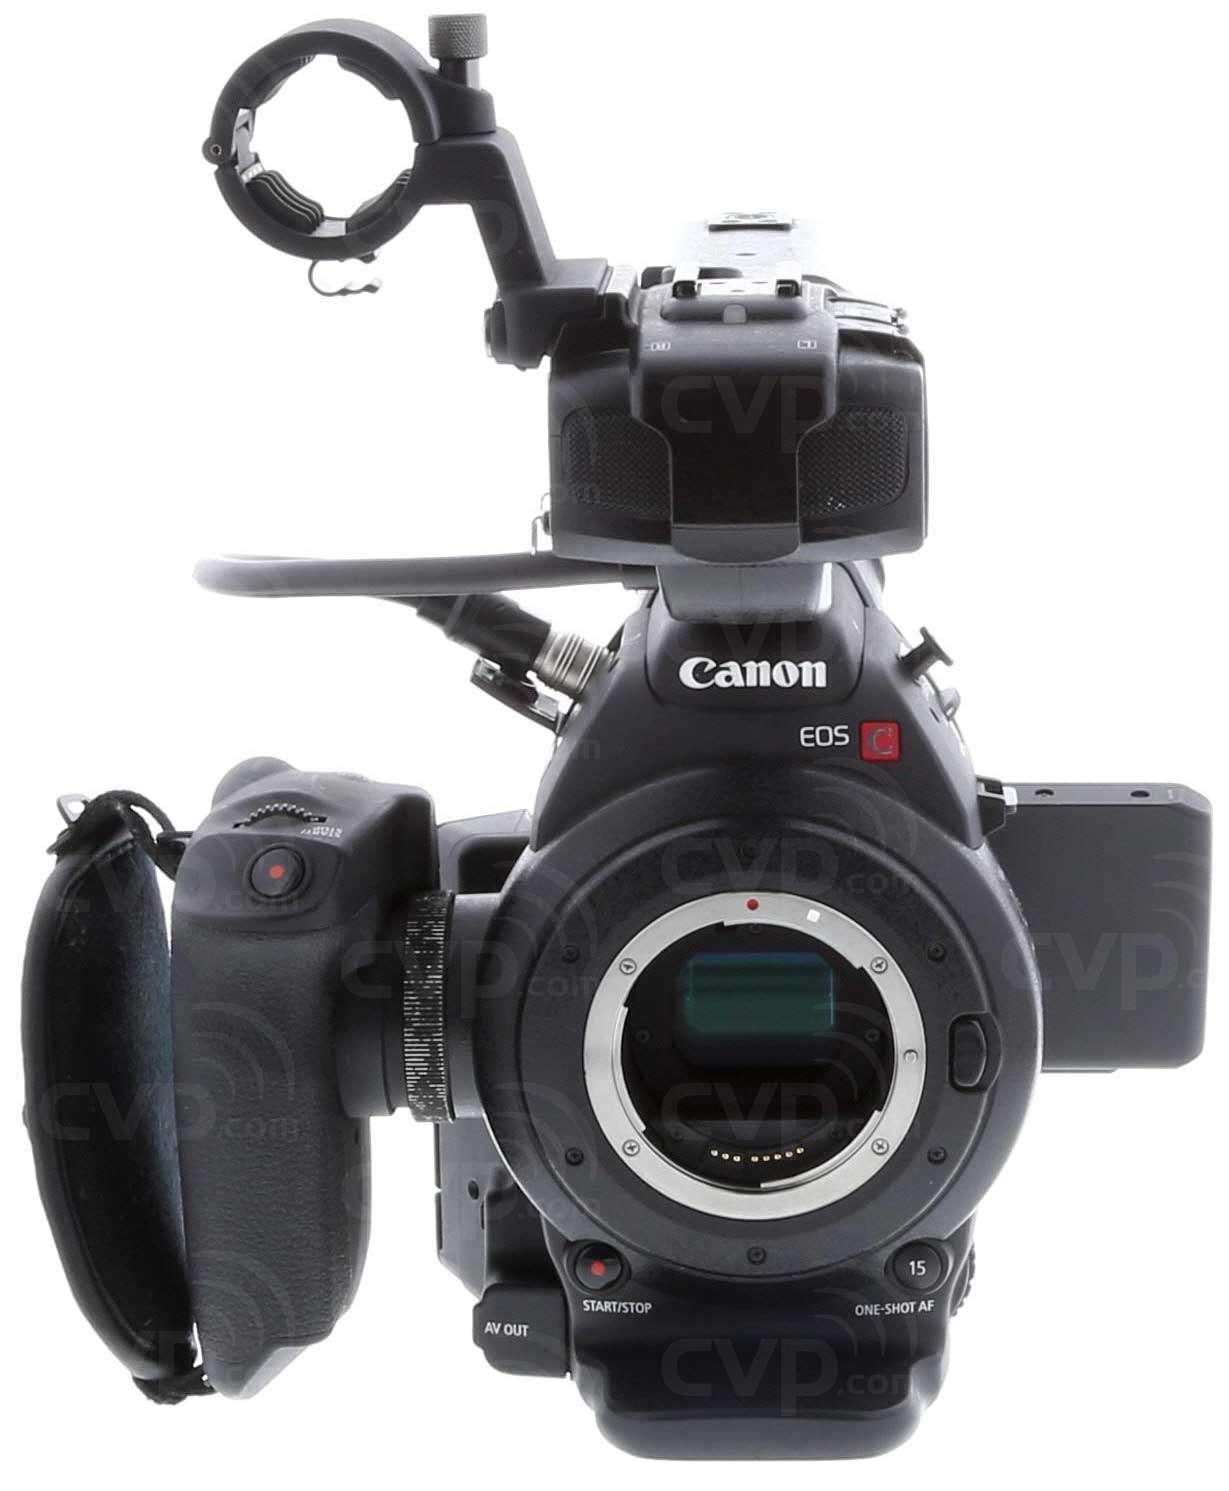 Ex-Demo Canon C100 Camcorder